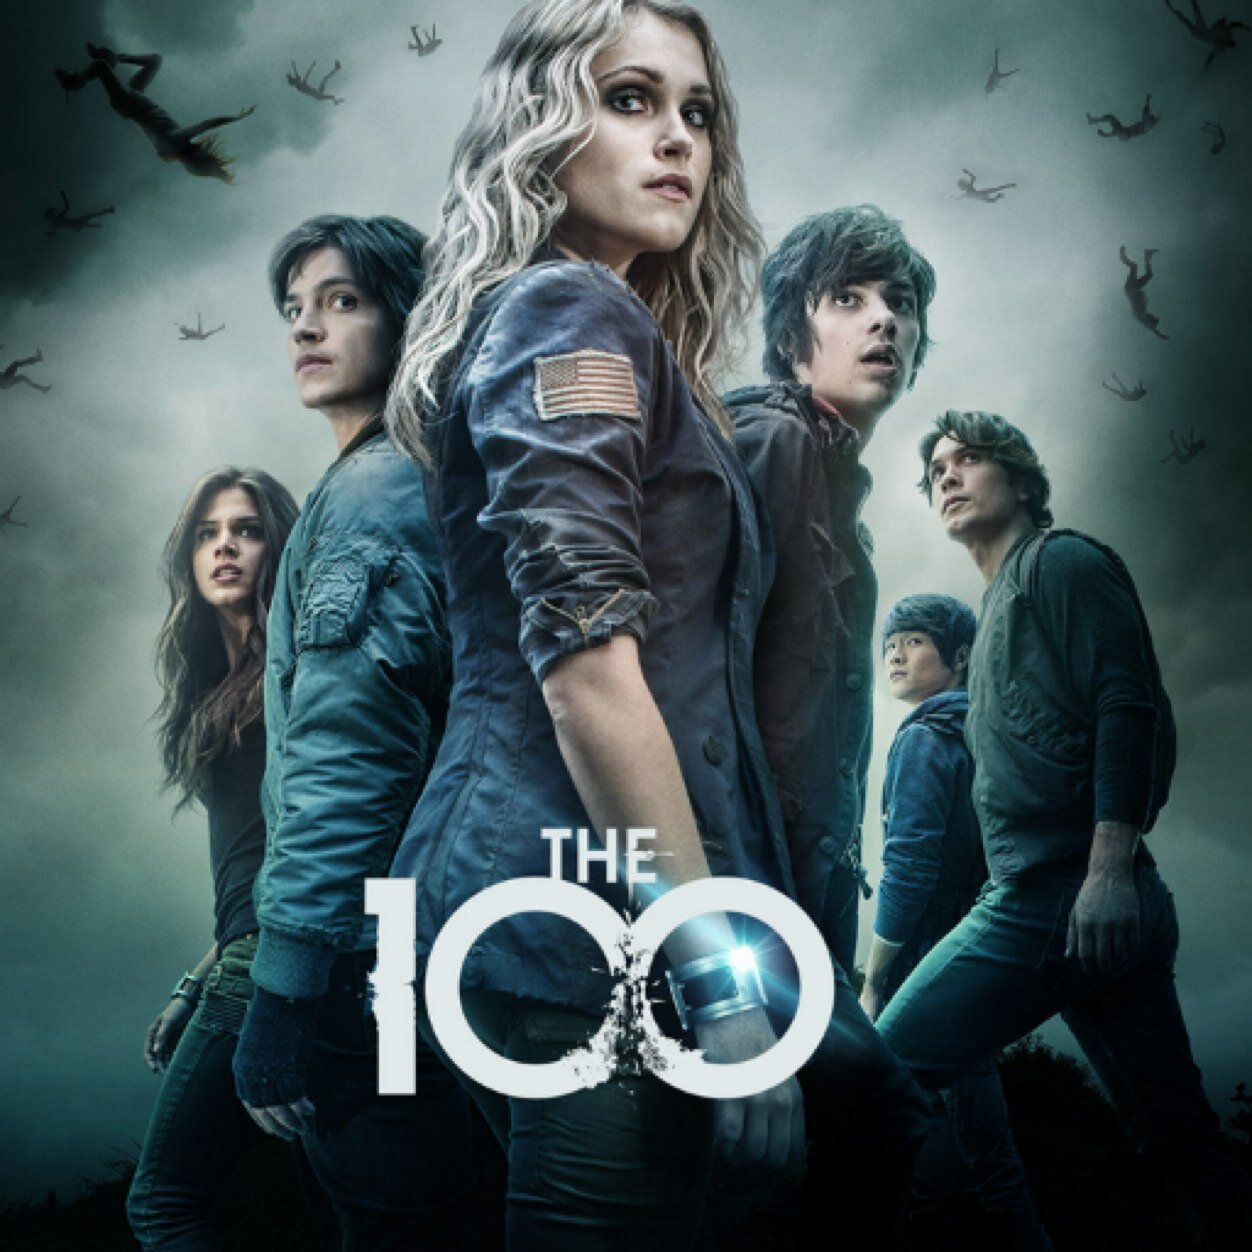 The 100 By Kass Morgan: Blog Tour!